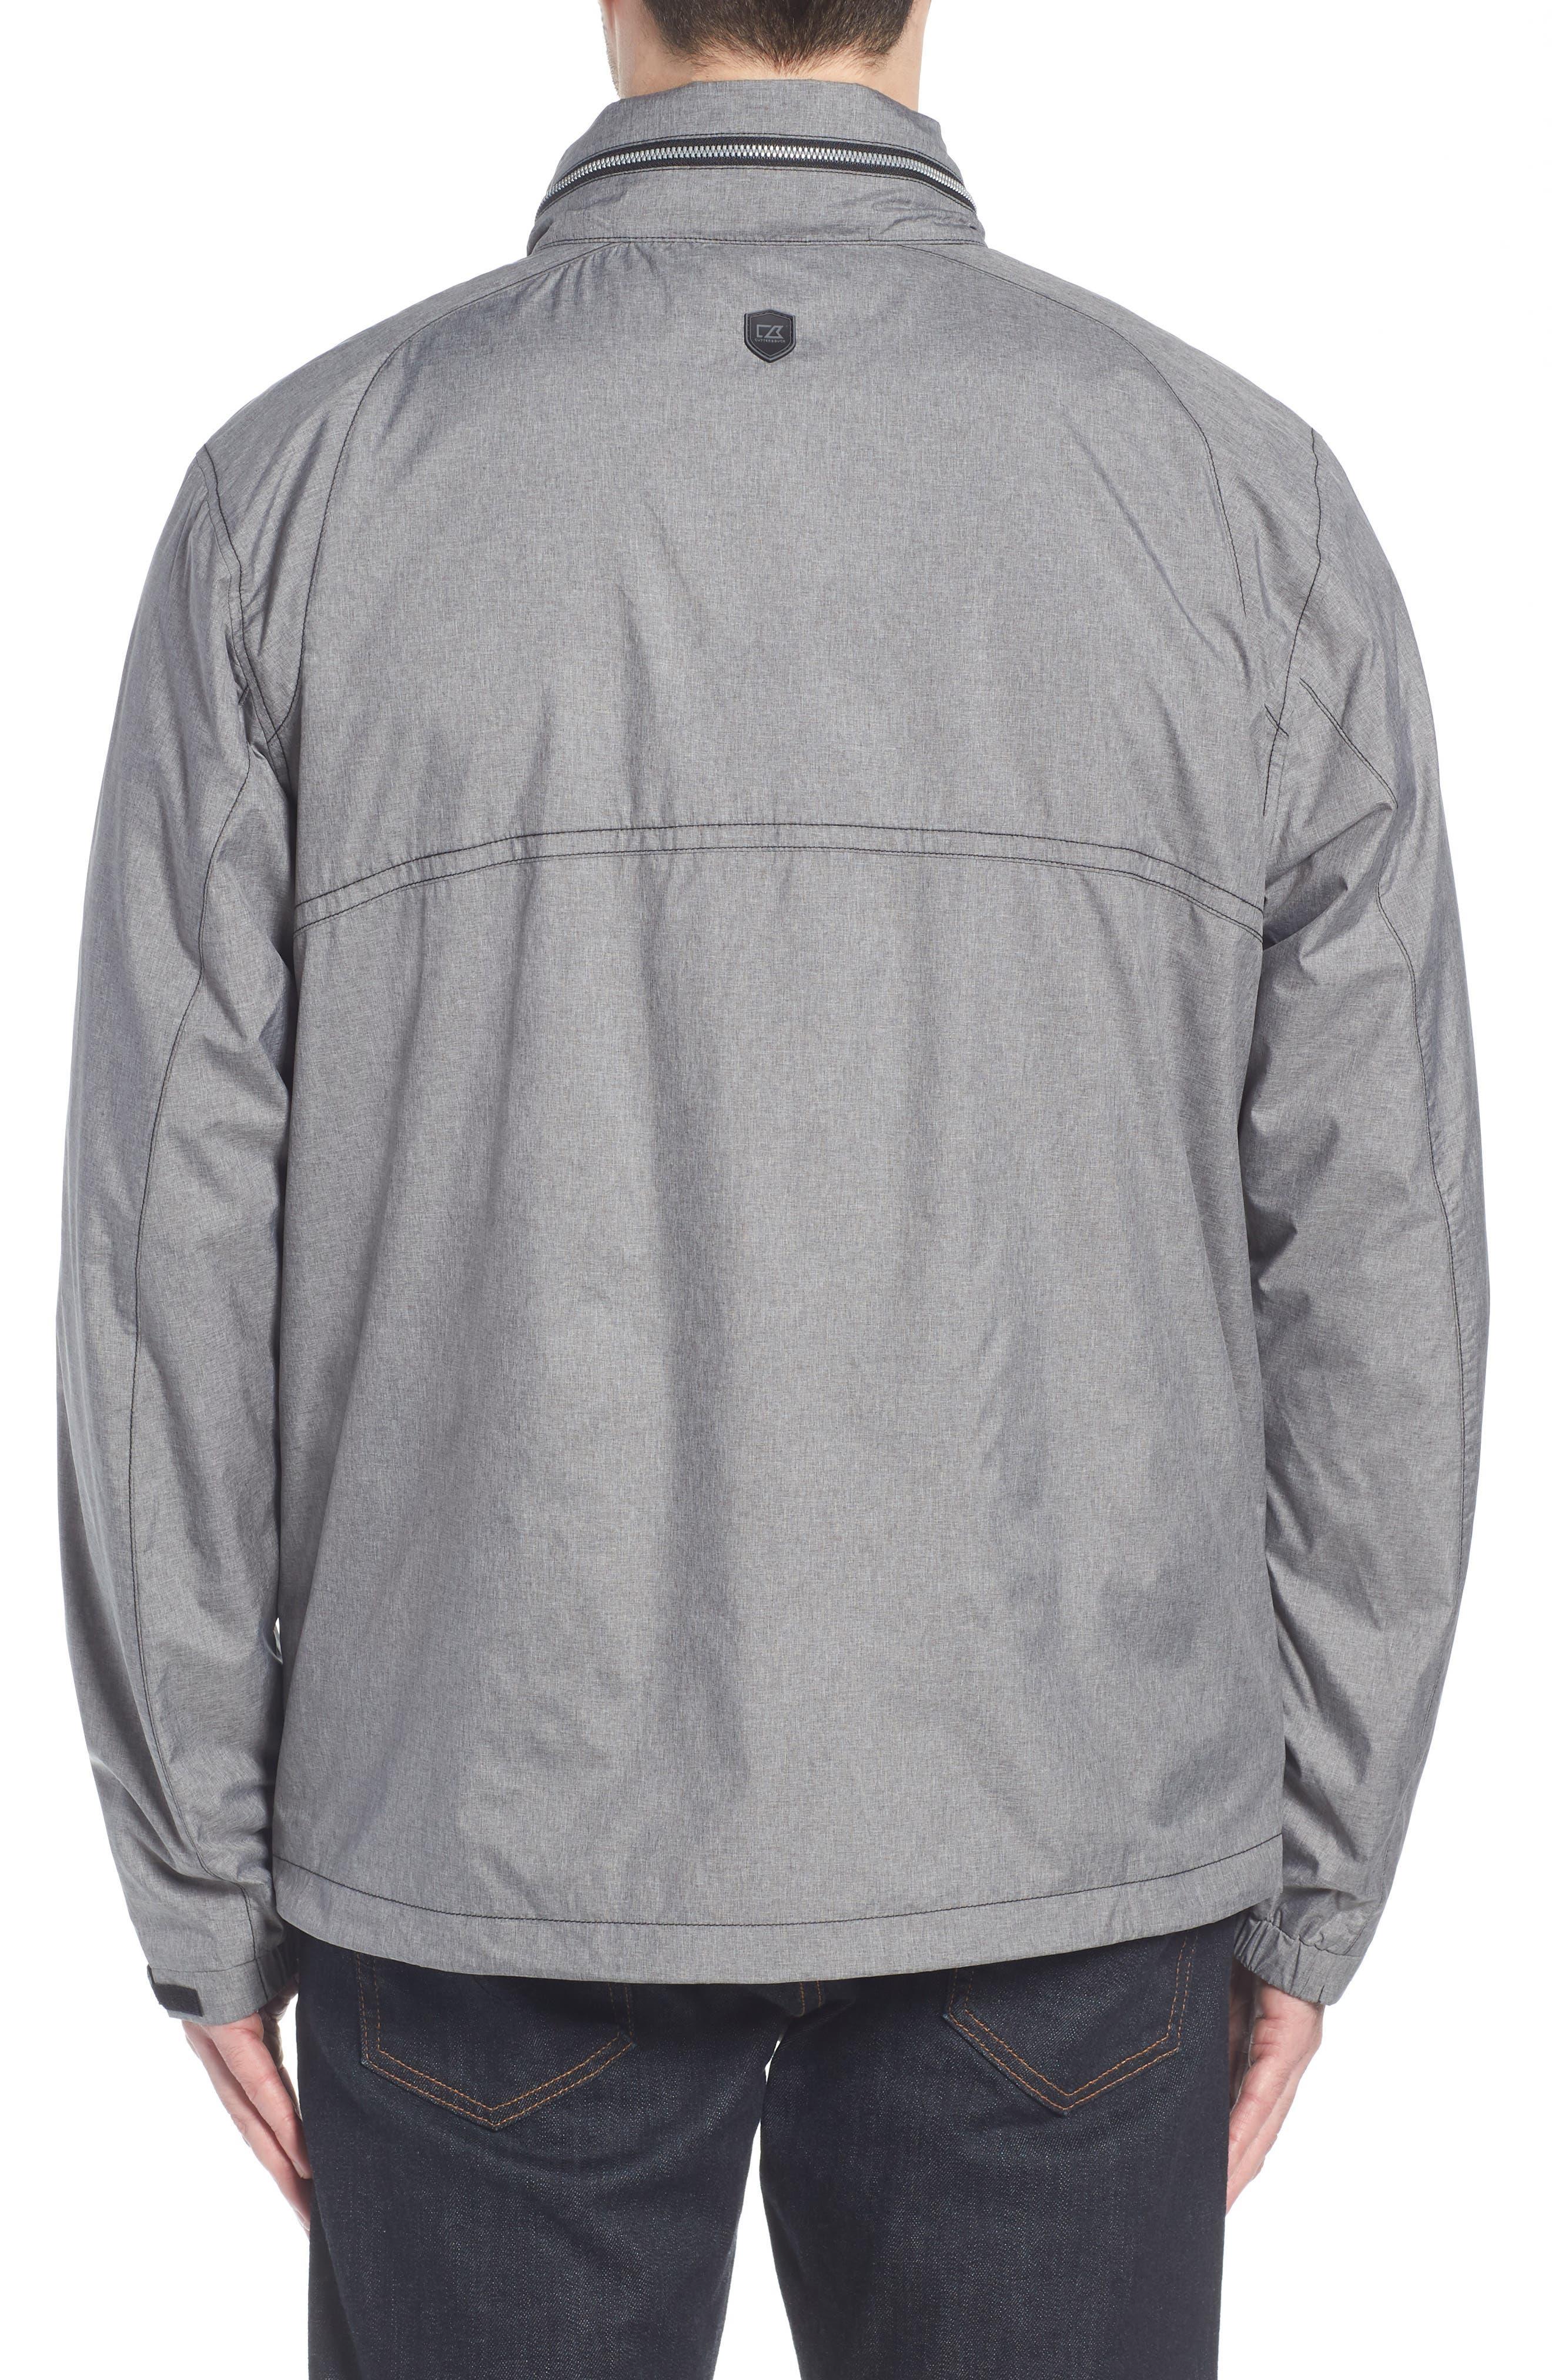 Panoramic Packable Jacket,                             Alternate thumbnail 2, color,                             BLACK